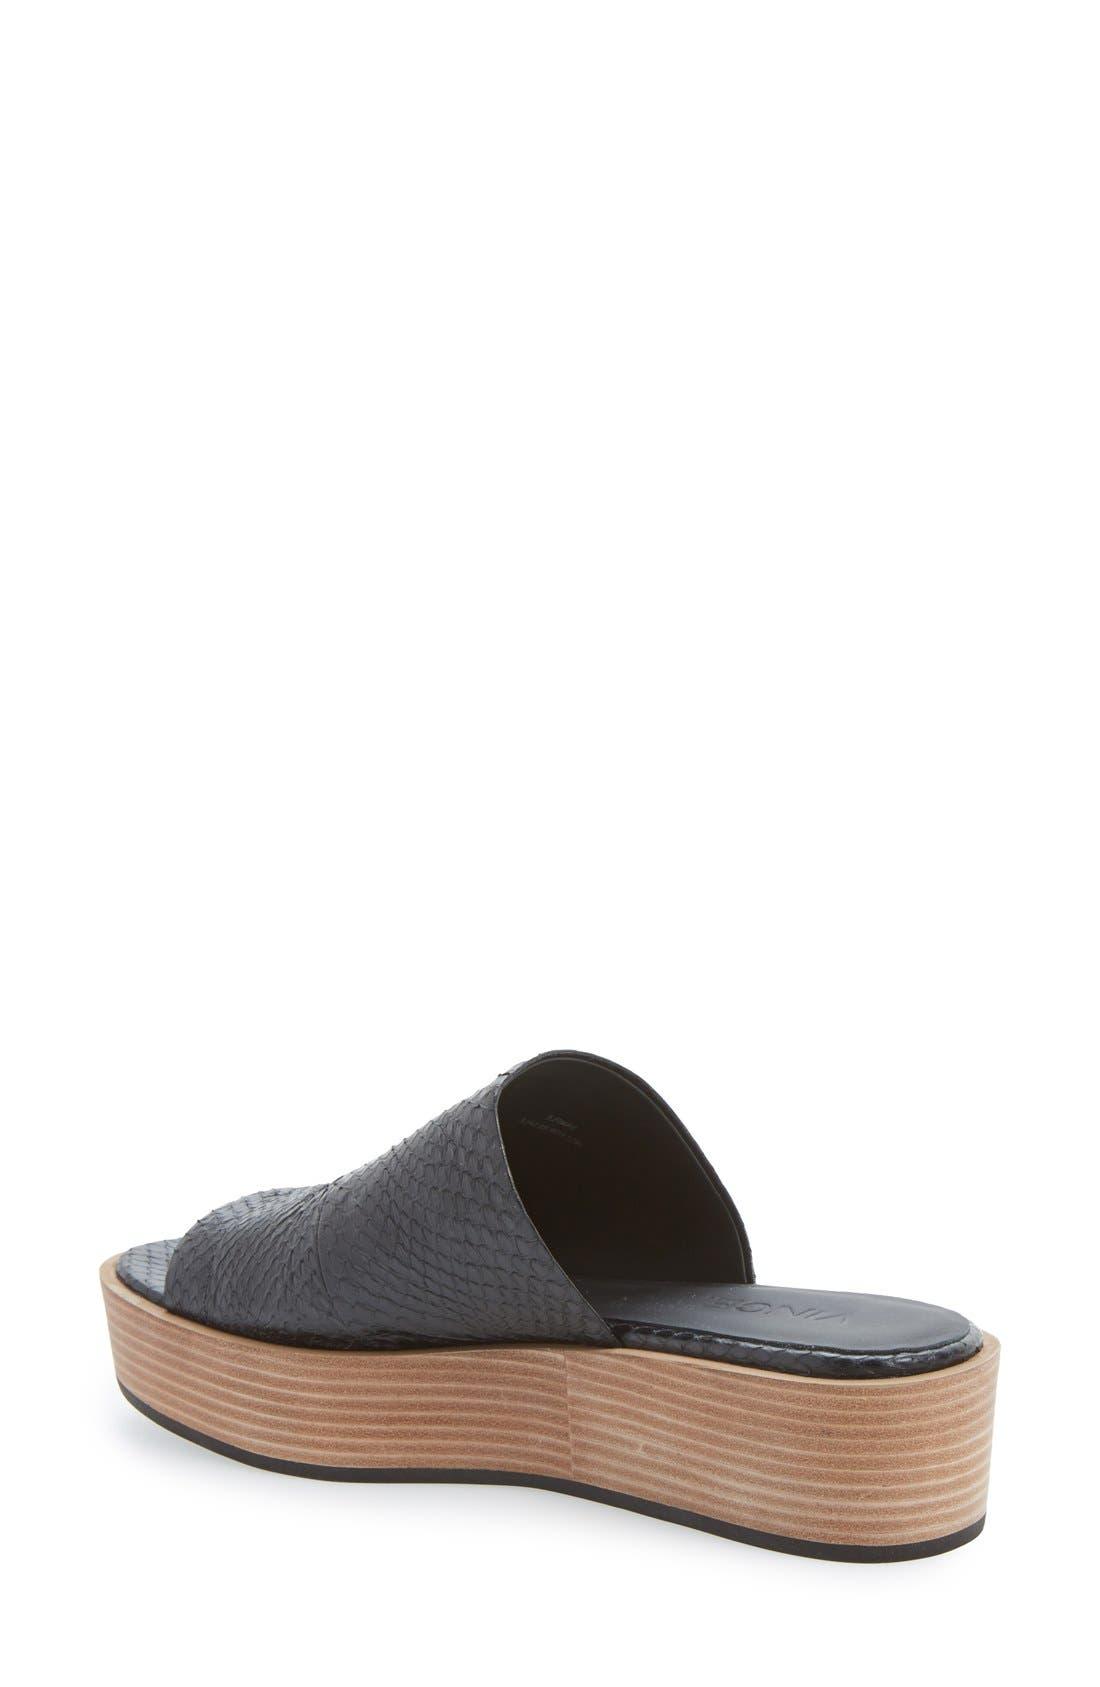 Alternate Image 2  - Vince 'Saskia 2' Platform Sandal (Women)